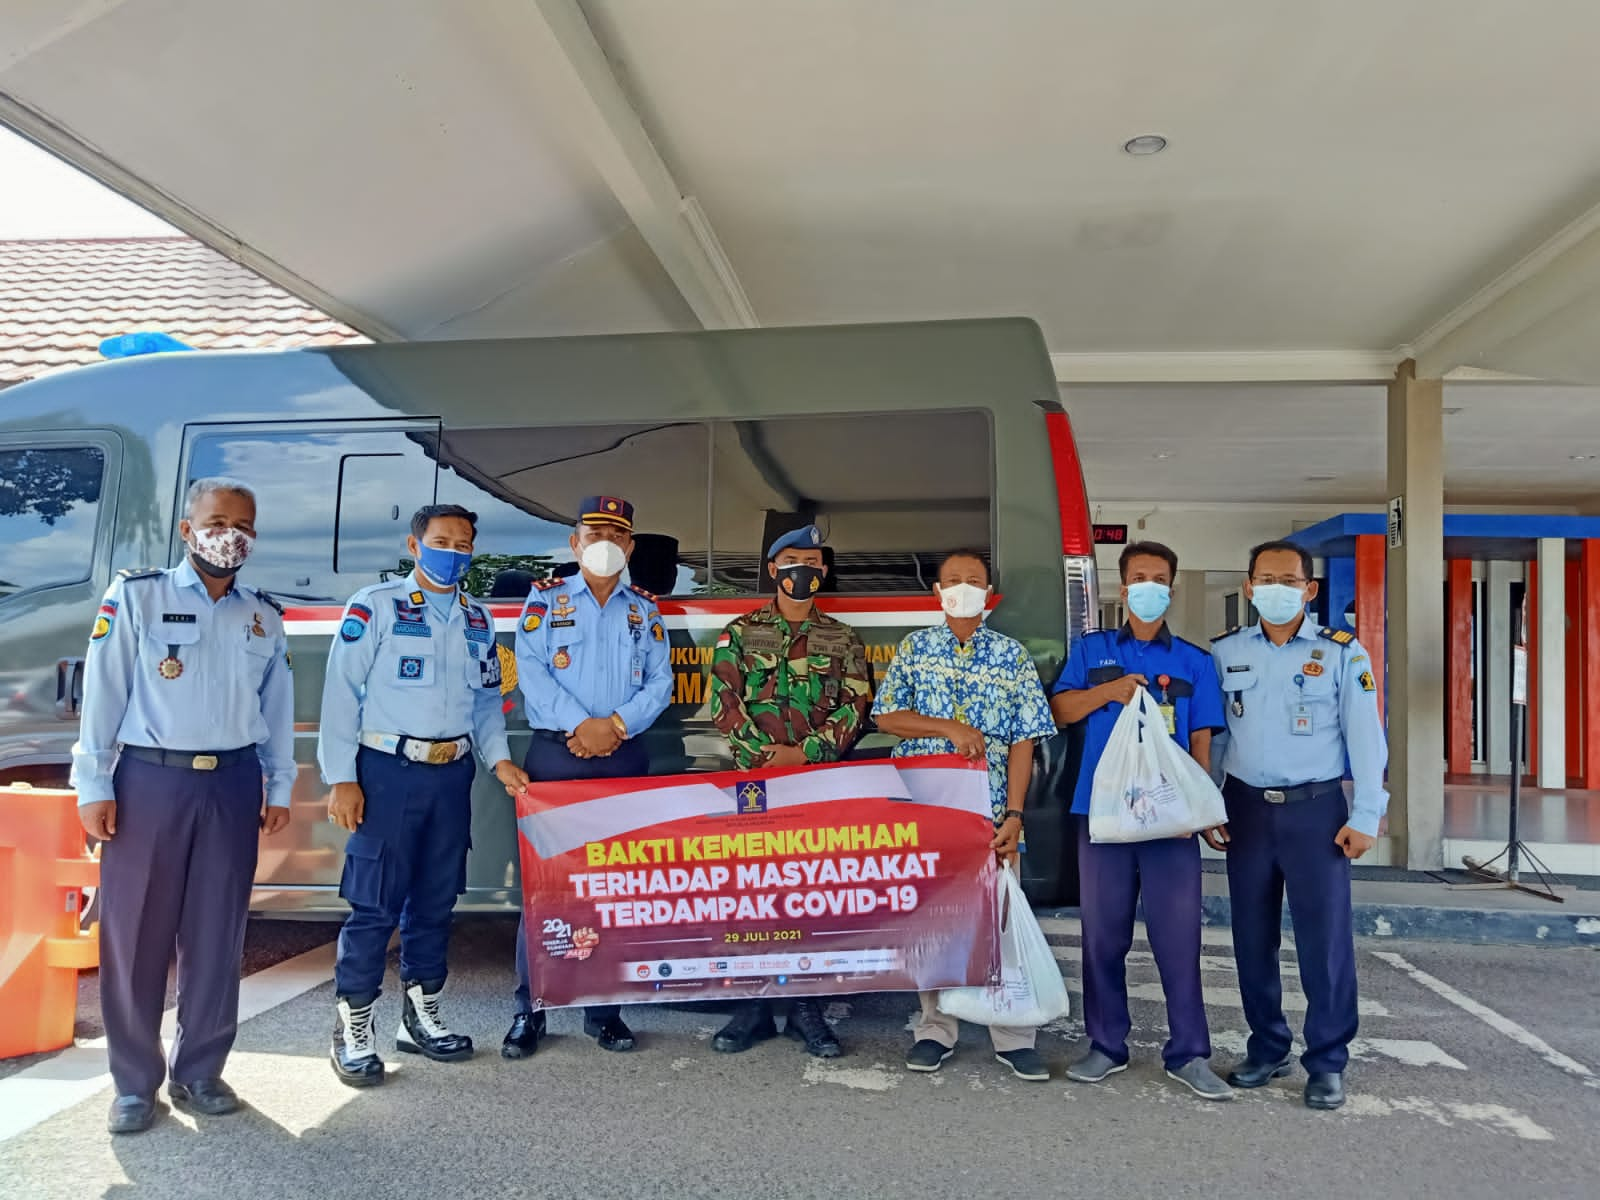 Kemenkumham Salurkan 46.000 Paket Sembako, Kalapas Tanjung pandan Sambangi Warga Terdampak